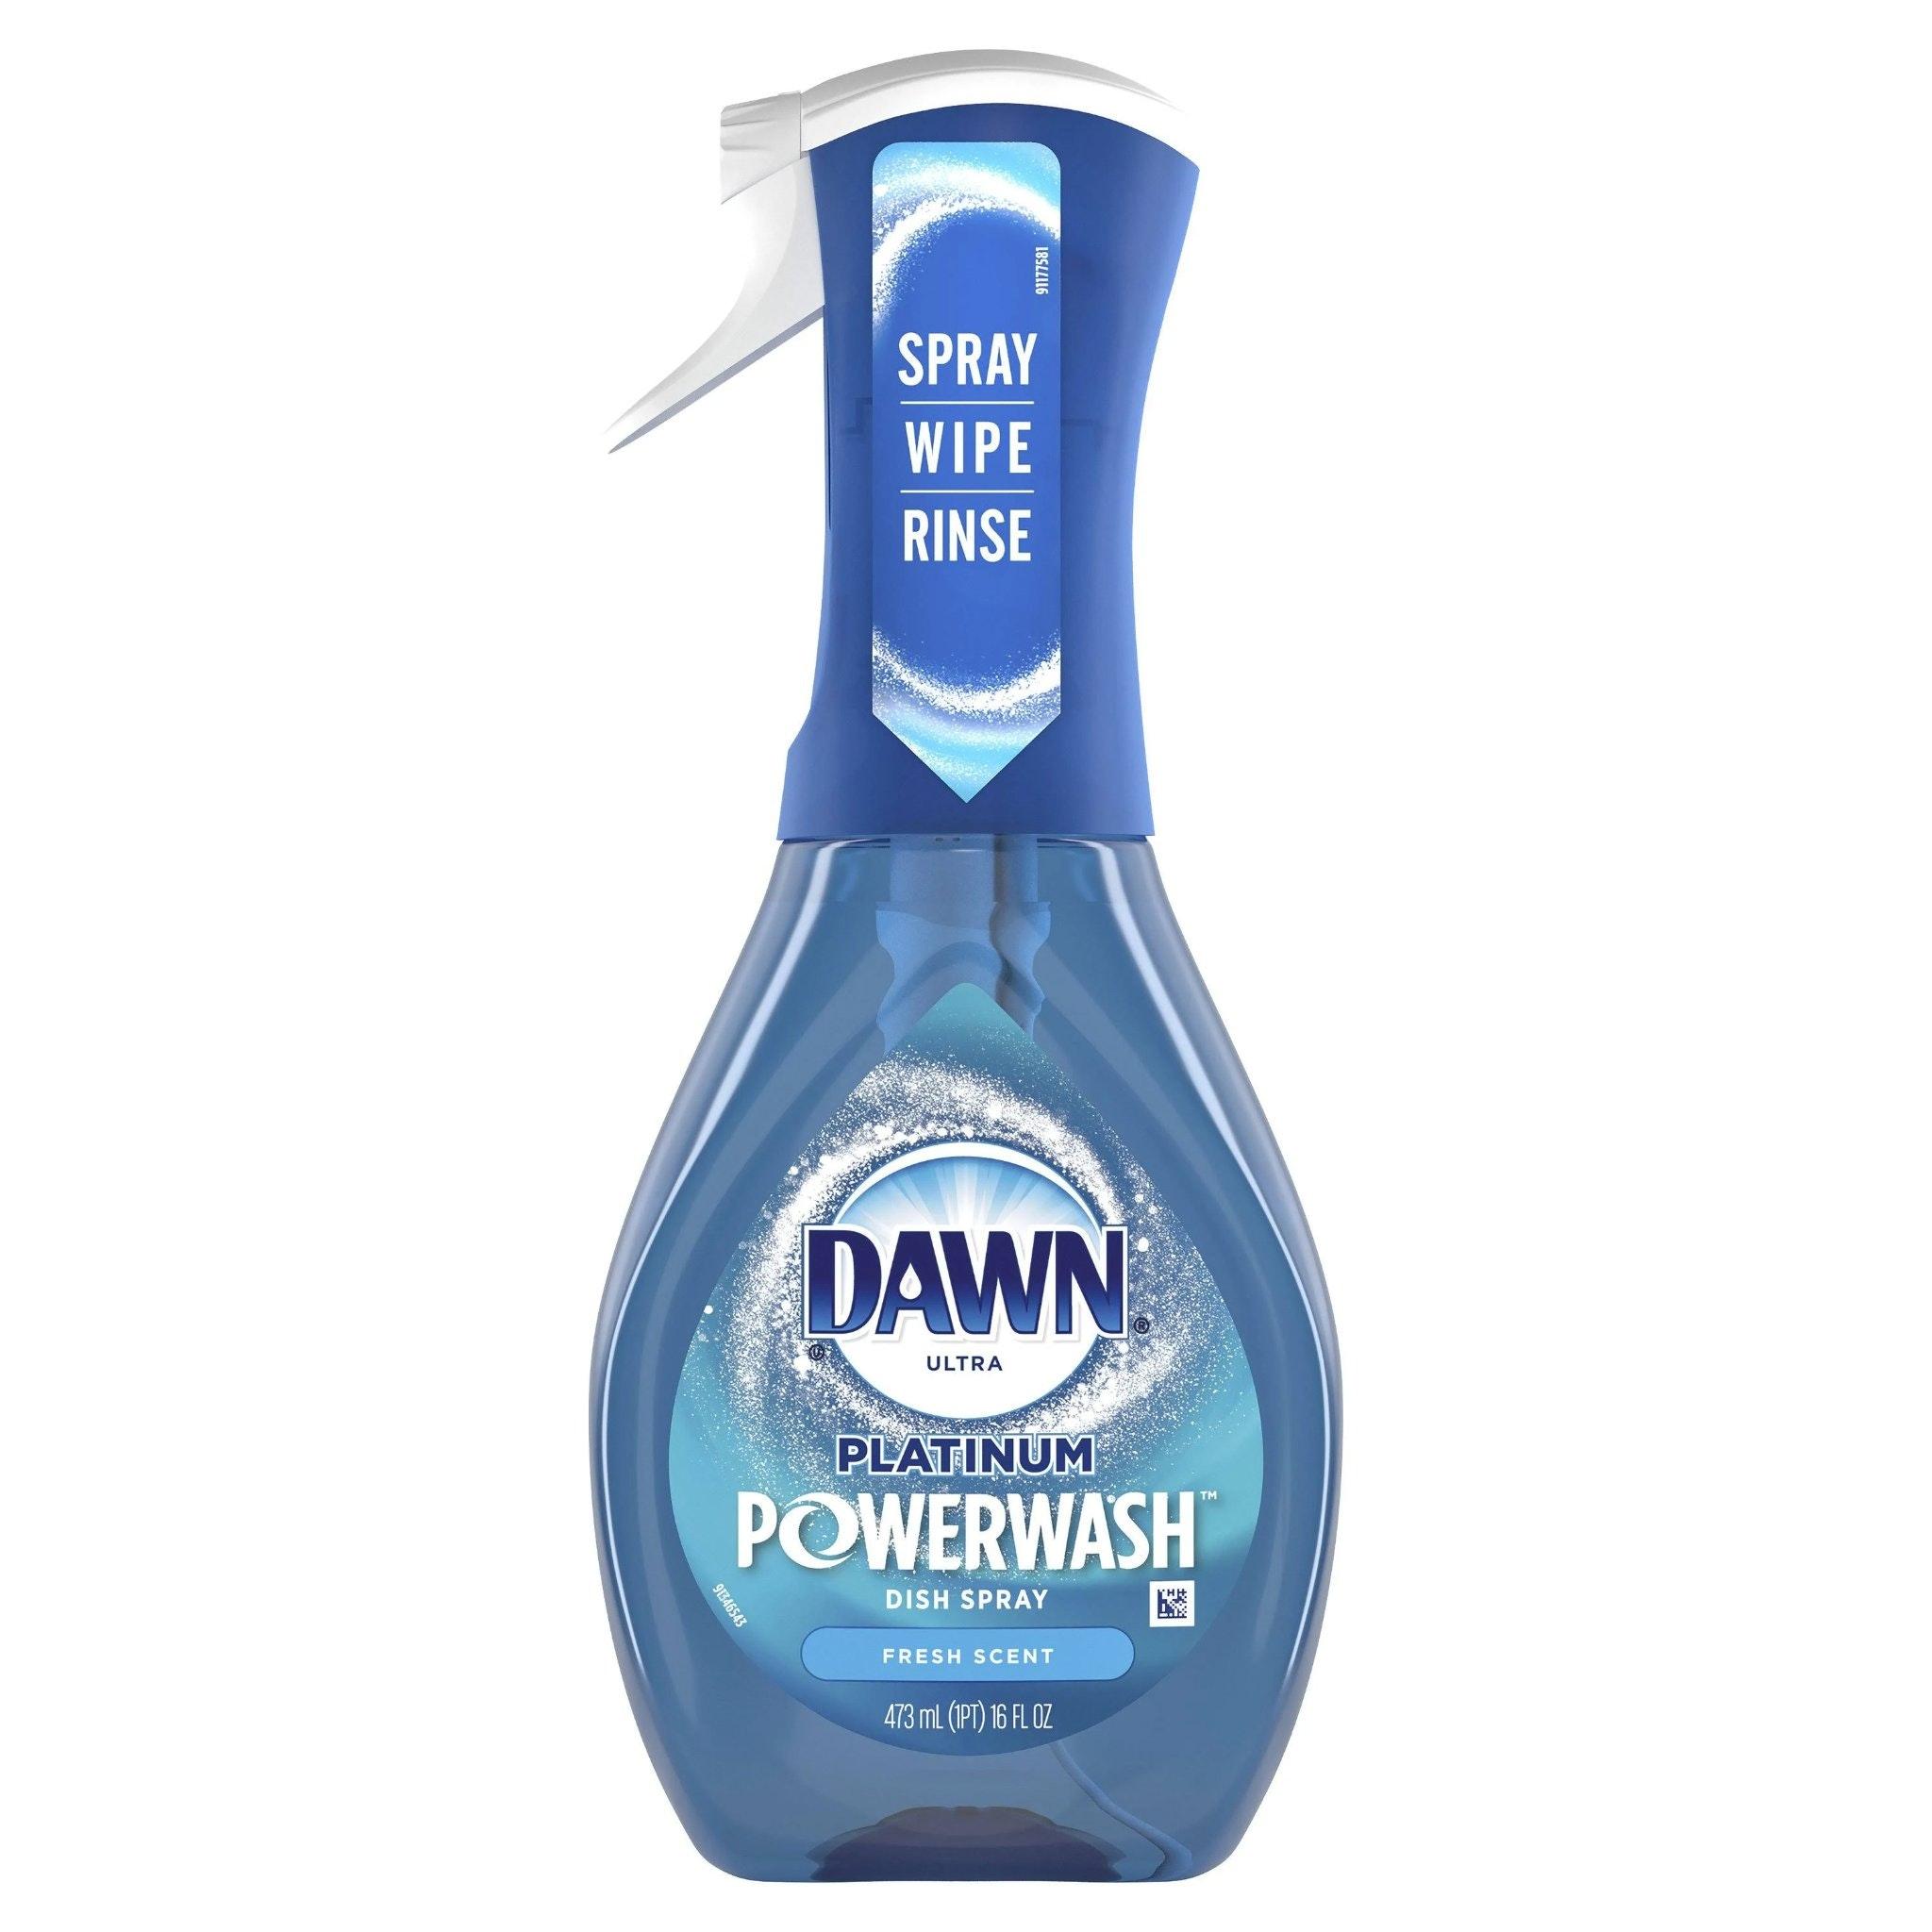 Dawn Ultra Platinum Powerwash Dish Spray